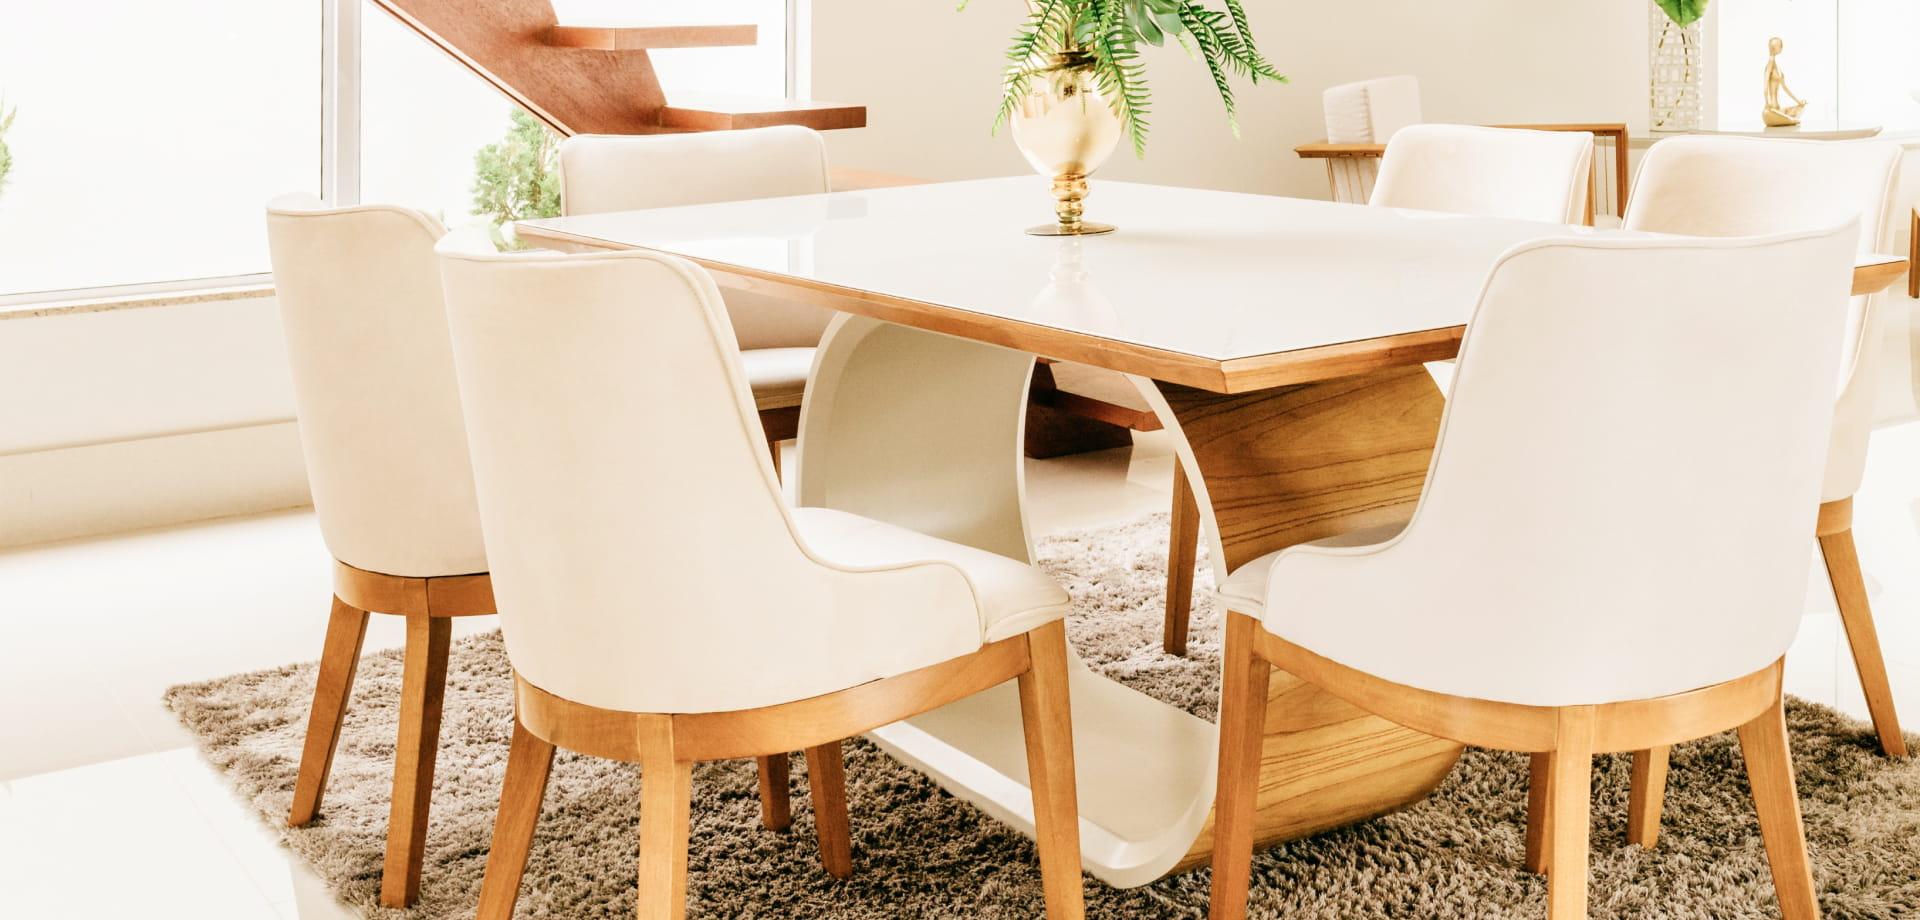 Lightwood rustic dining room